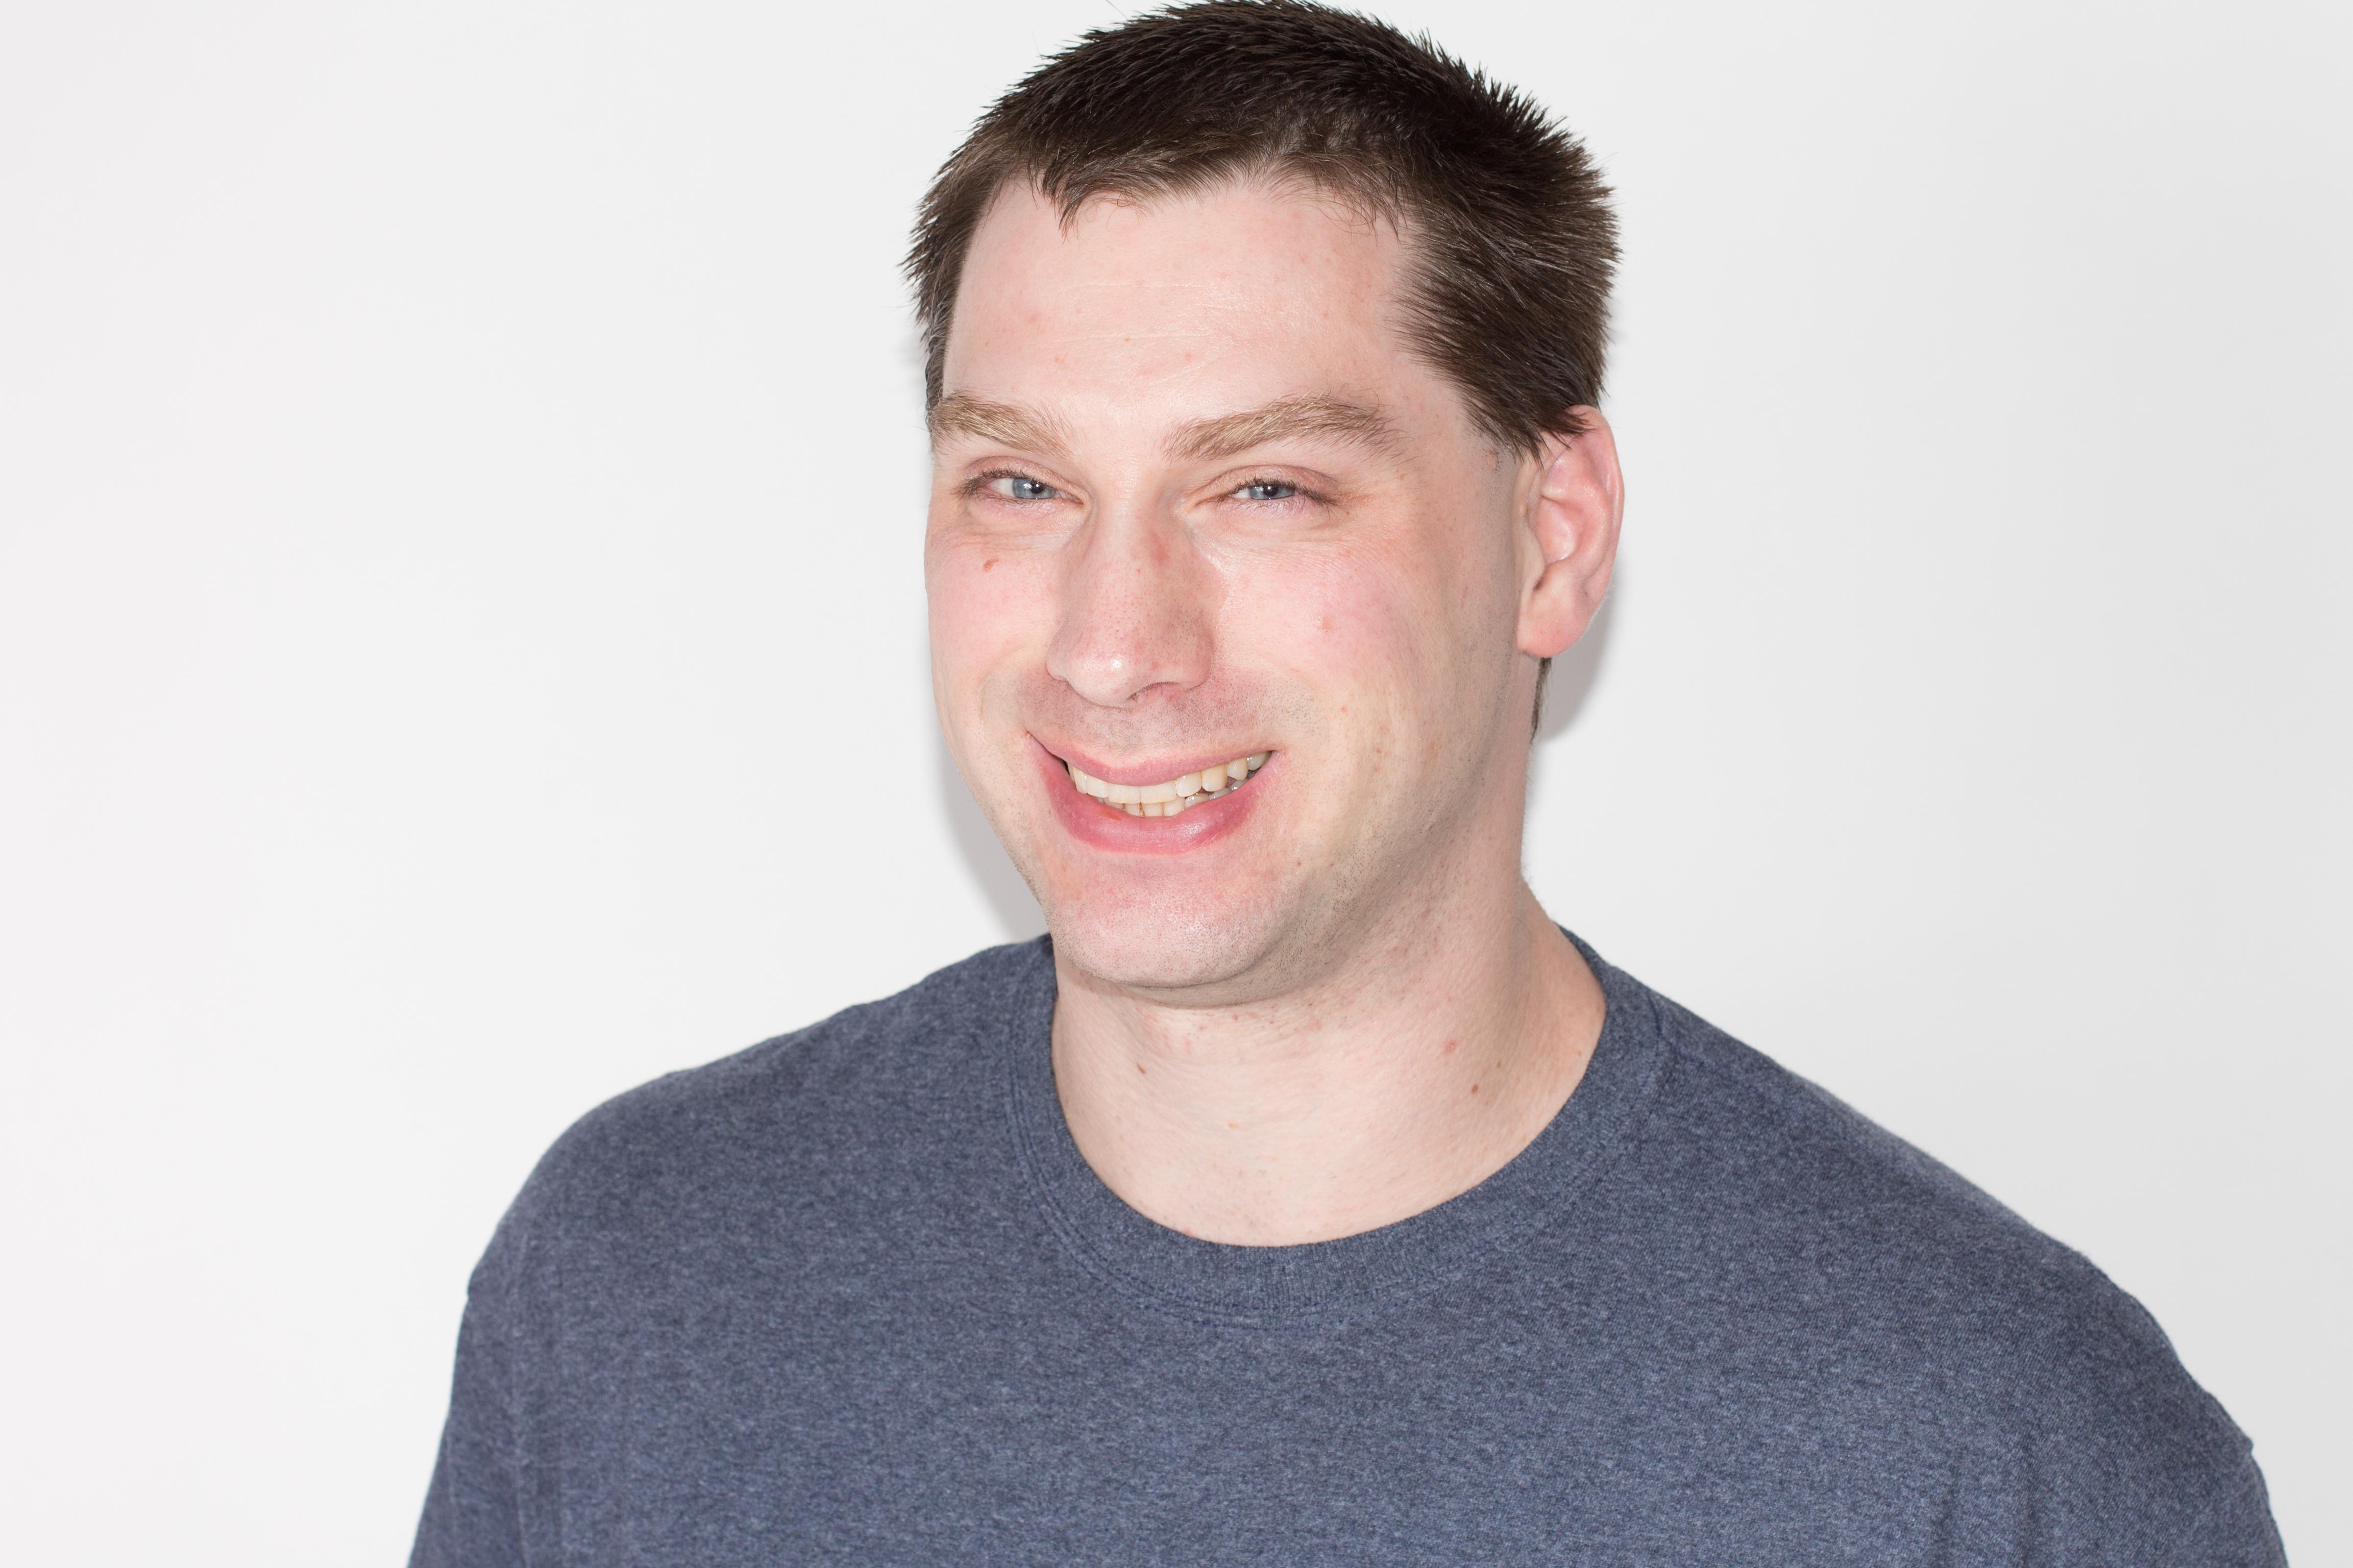 Andrew Johnson, Machine Tool Technology graduate